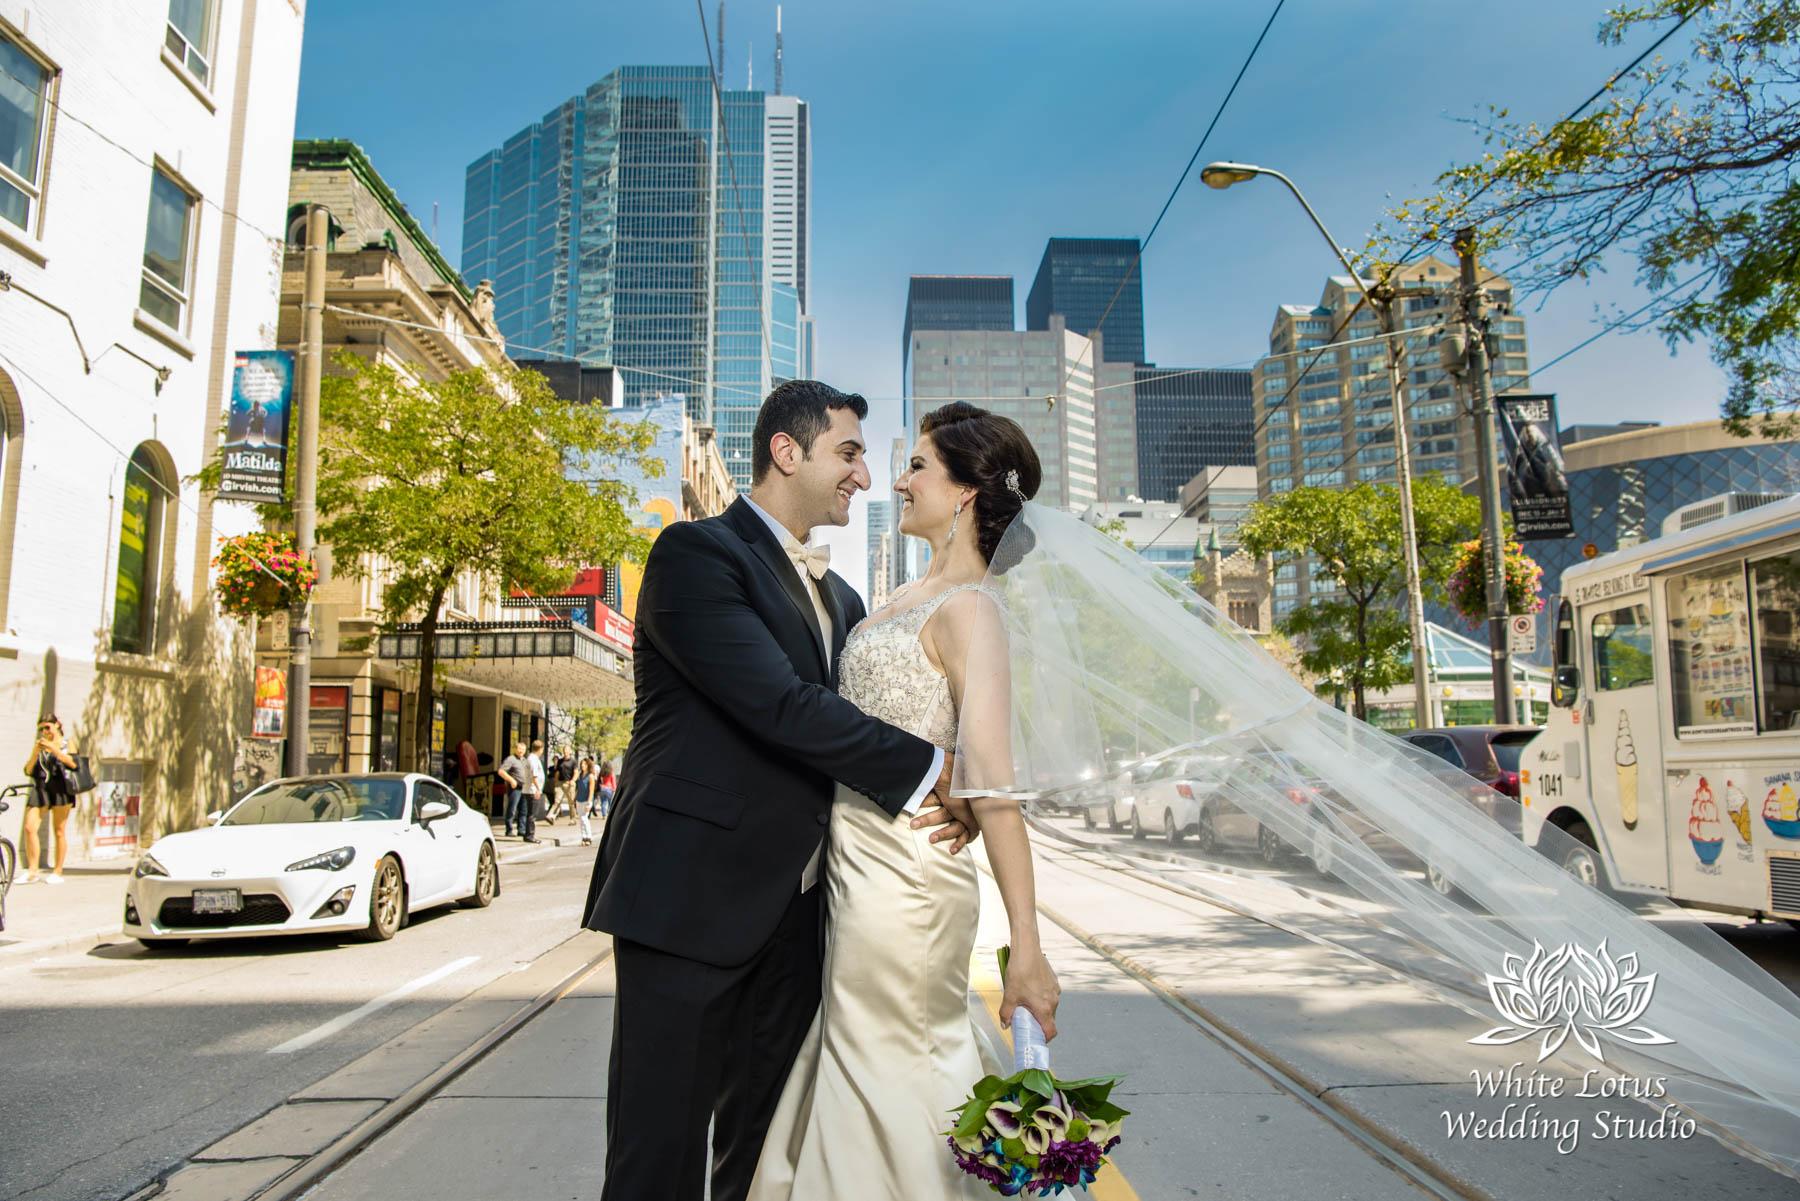 083 - Wedding - Toronto - Downtown wedding photo-walk - PW